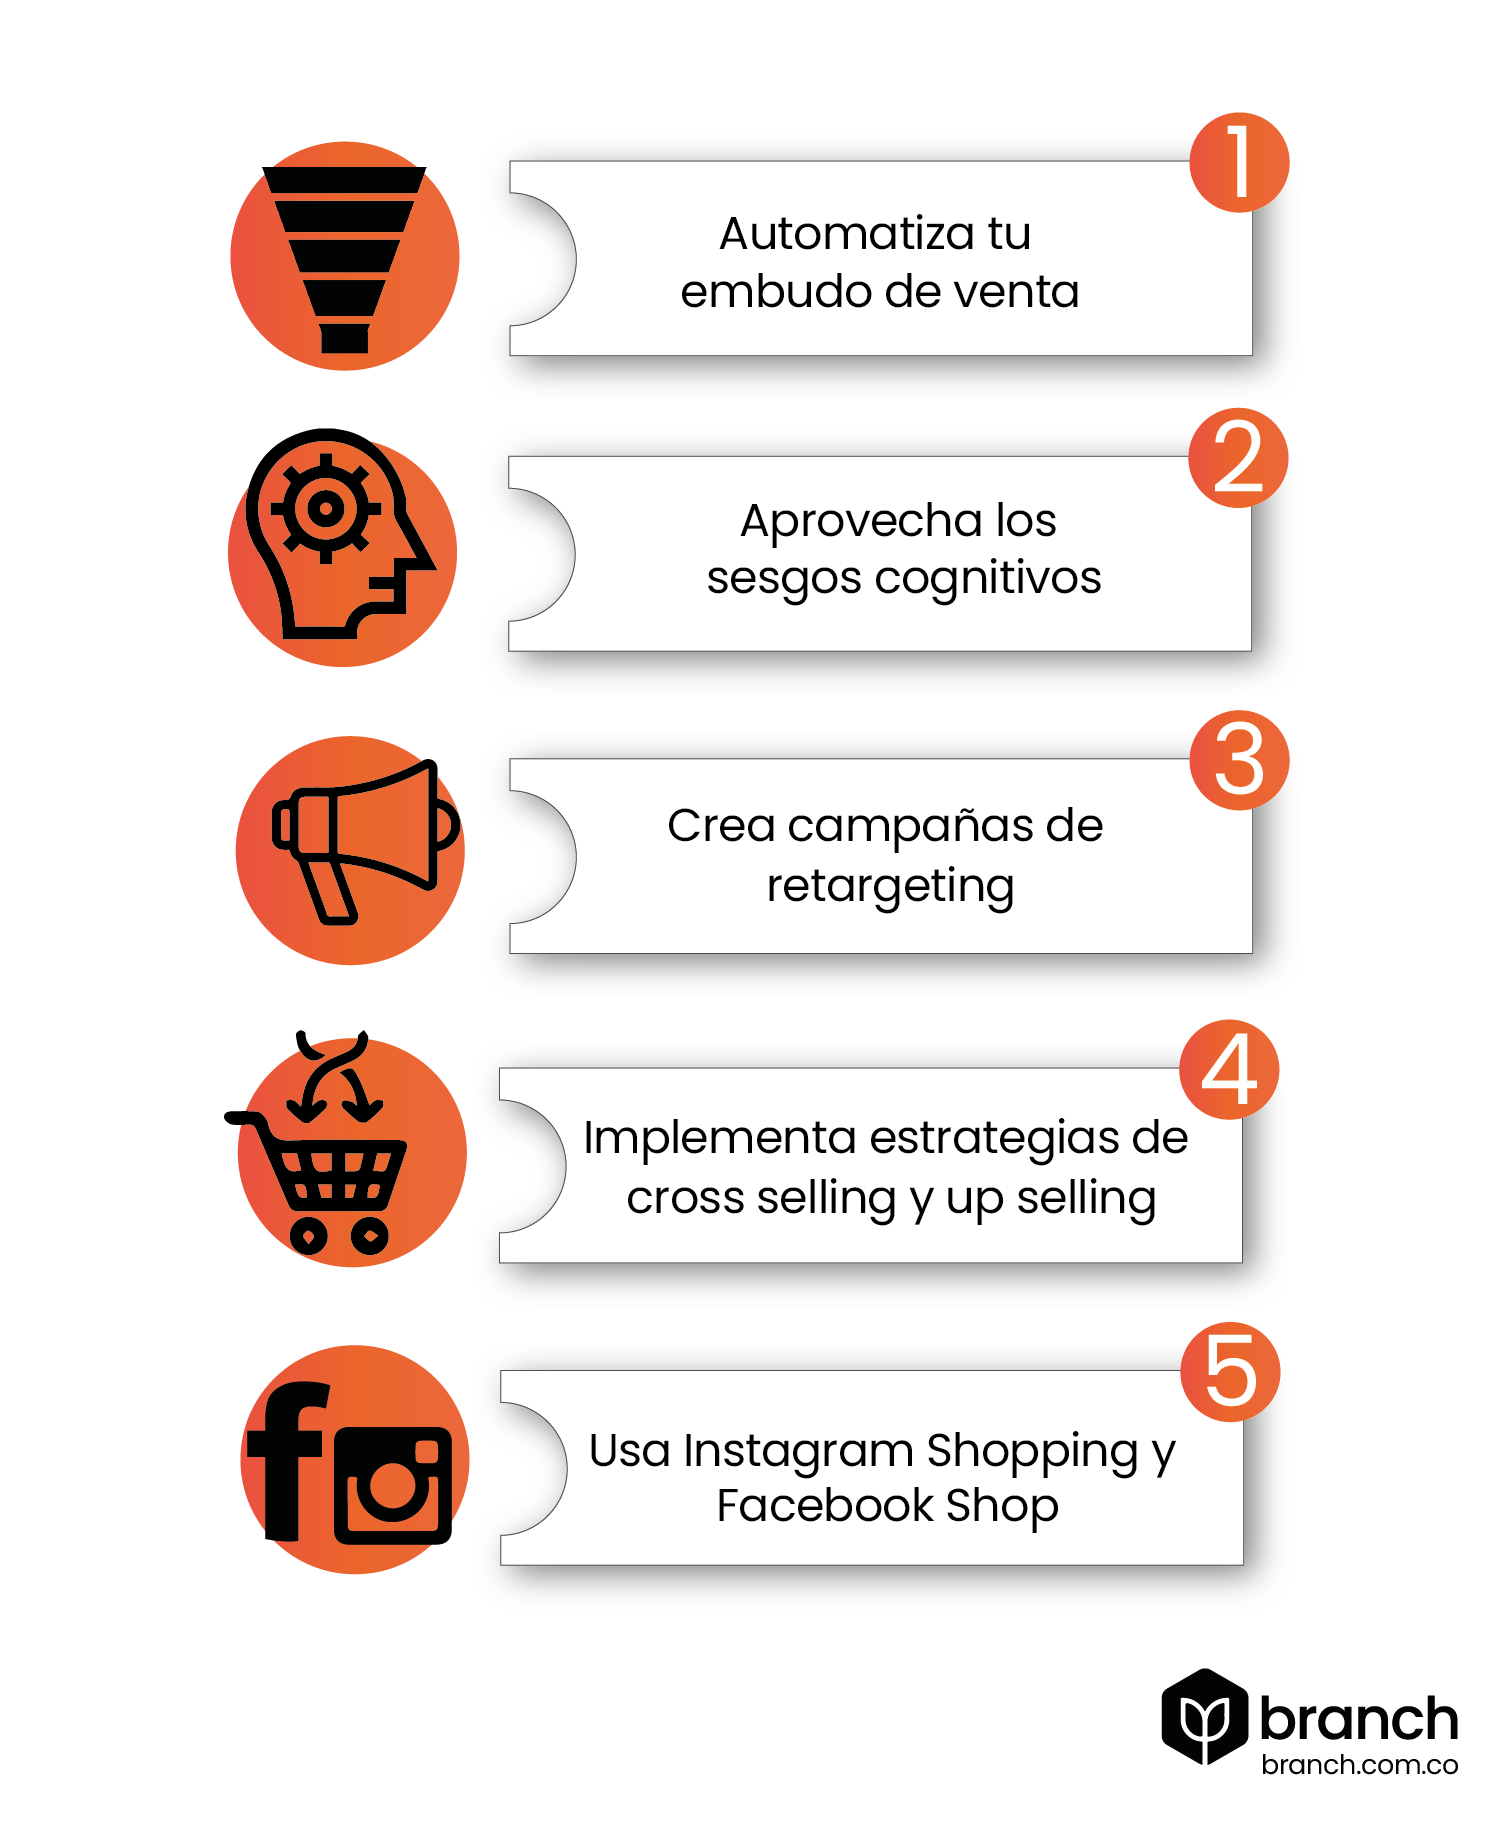 estrategias-para-aumentar-las-ventas-de-tu-e-commerce